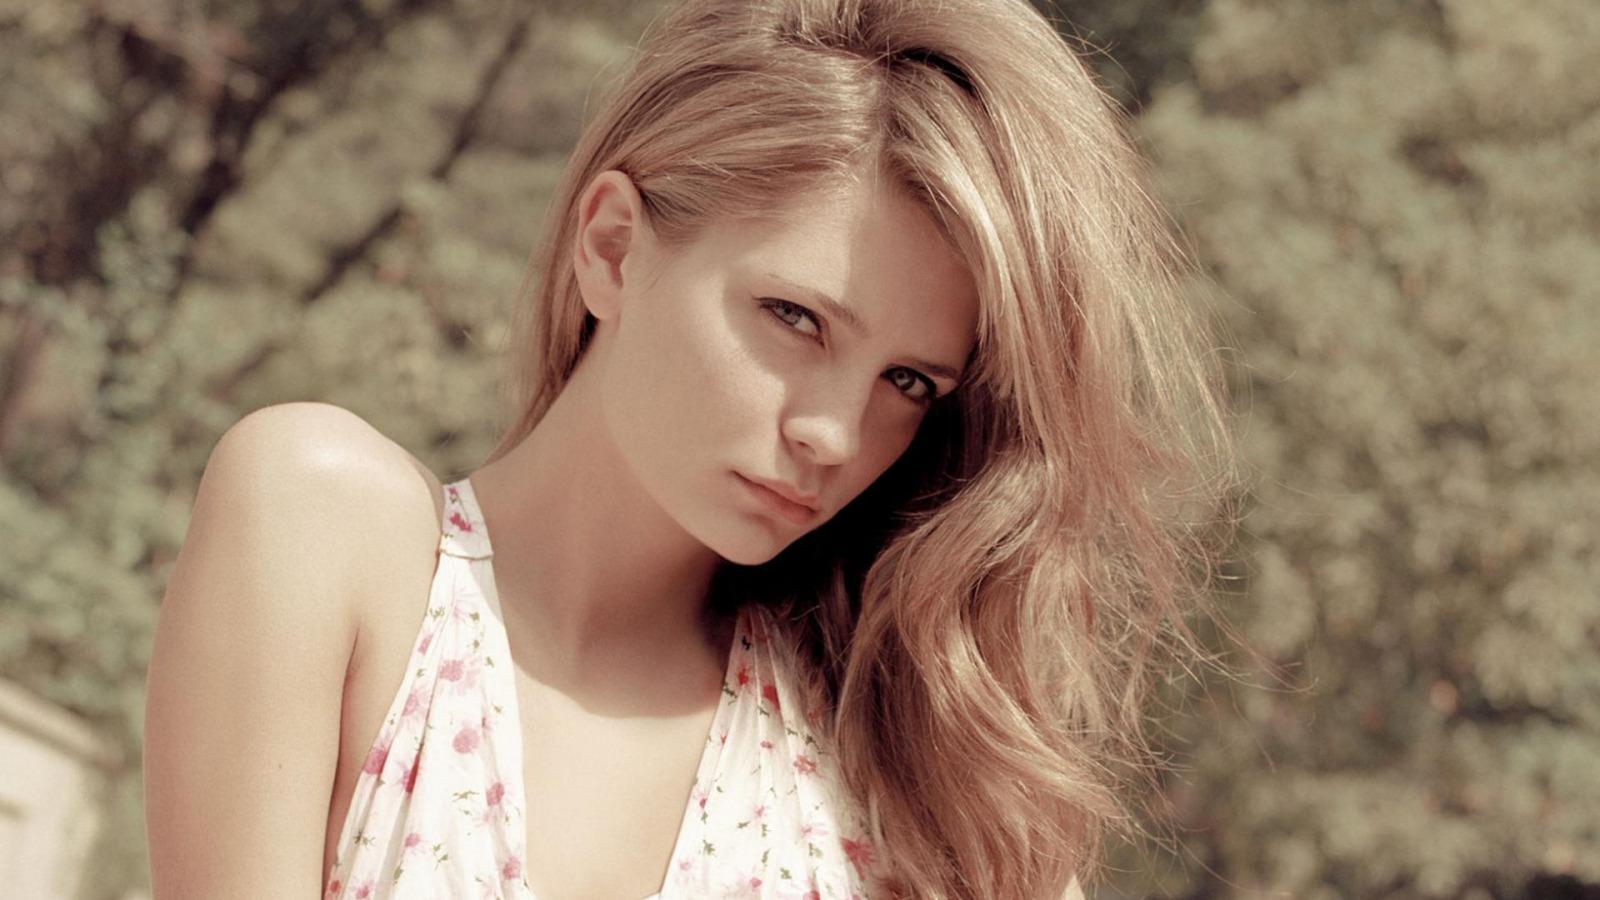 Gorgeous girl pics hot naked